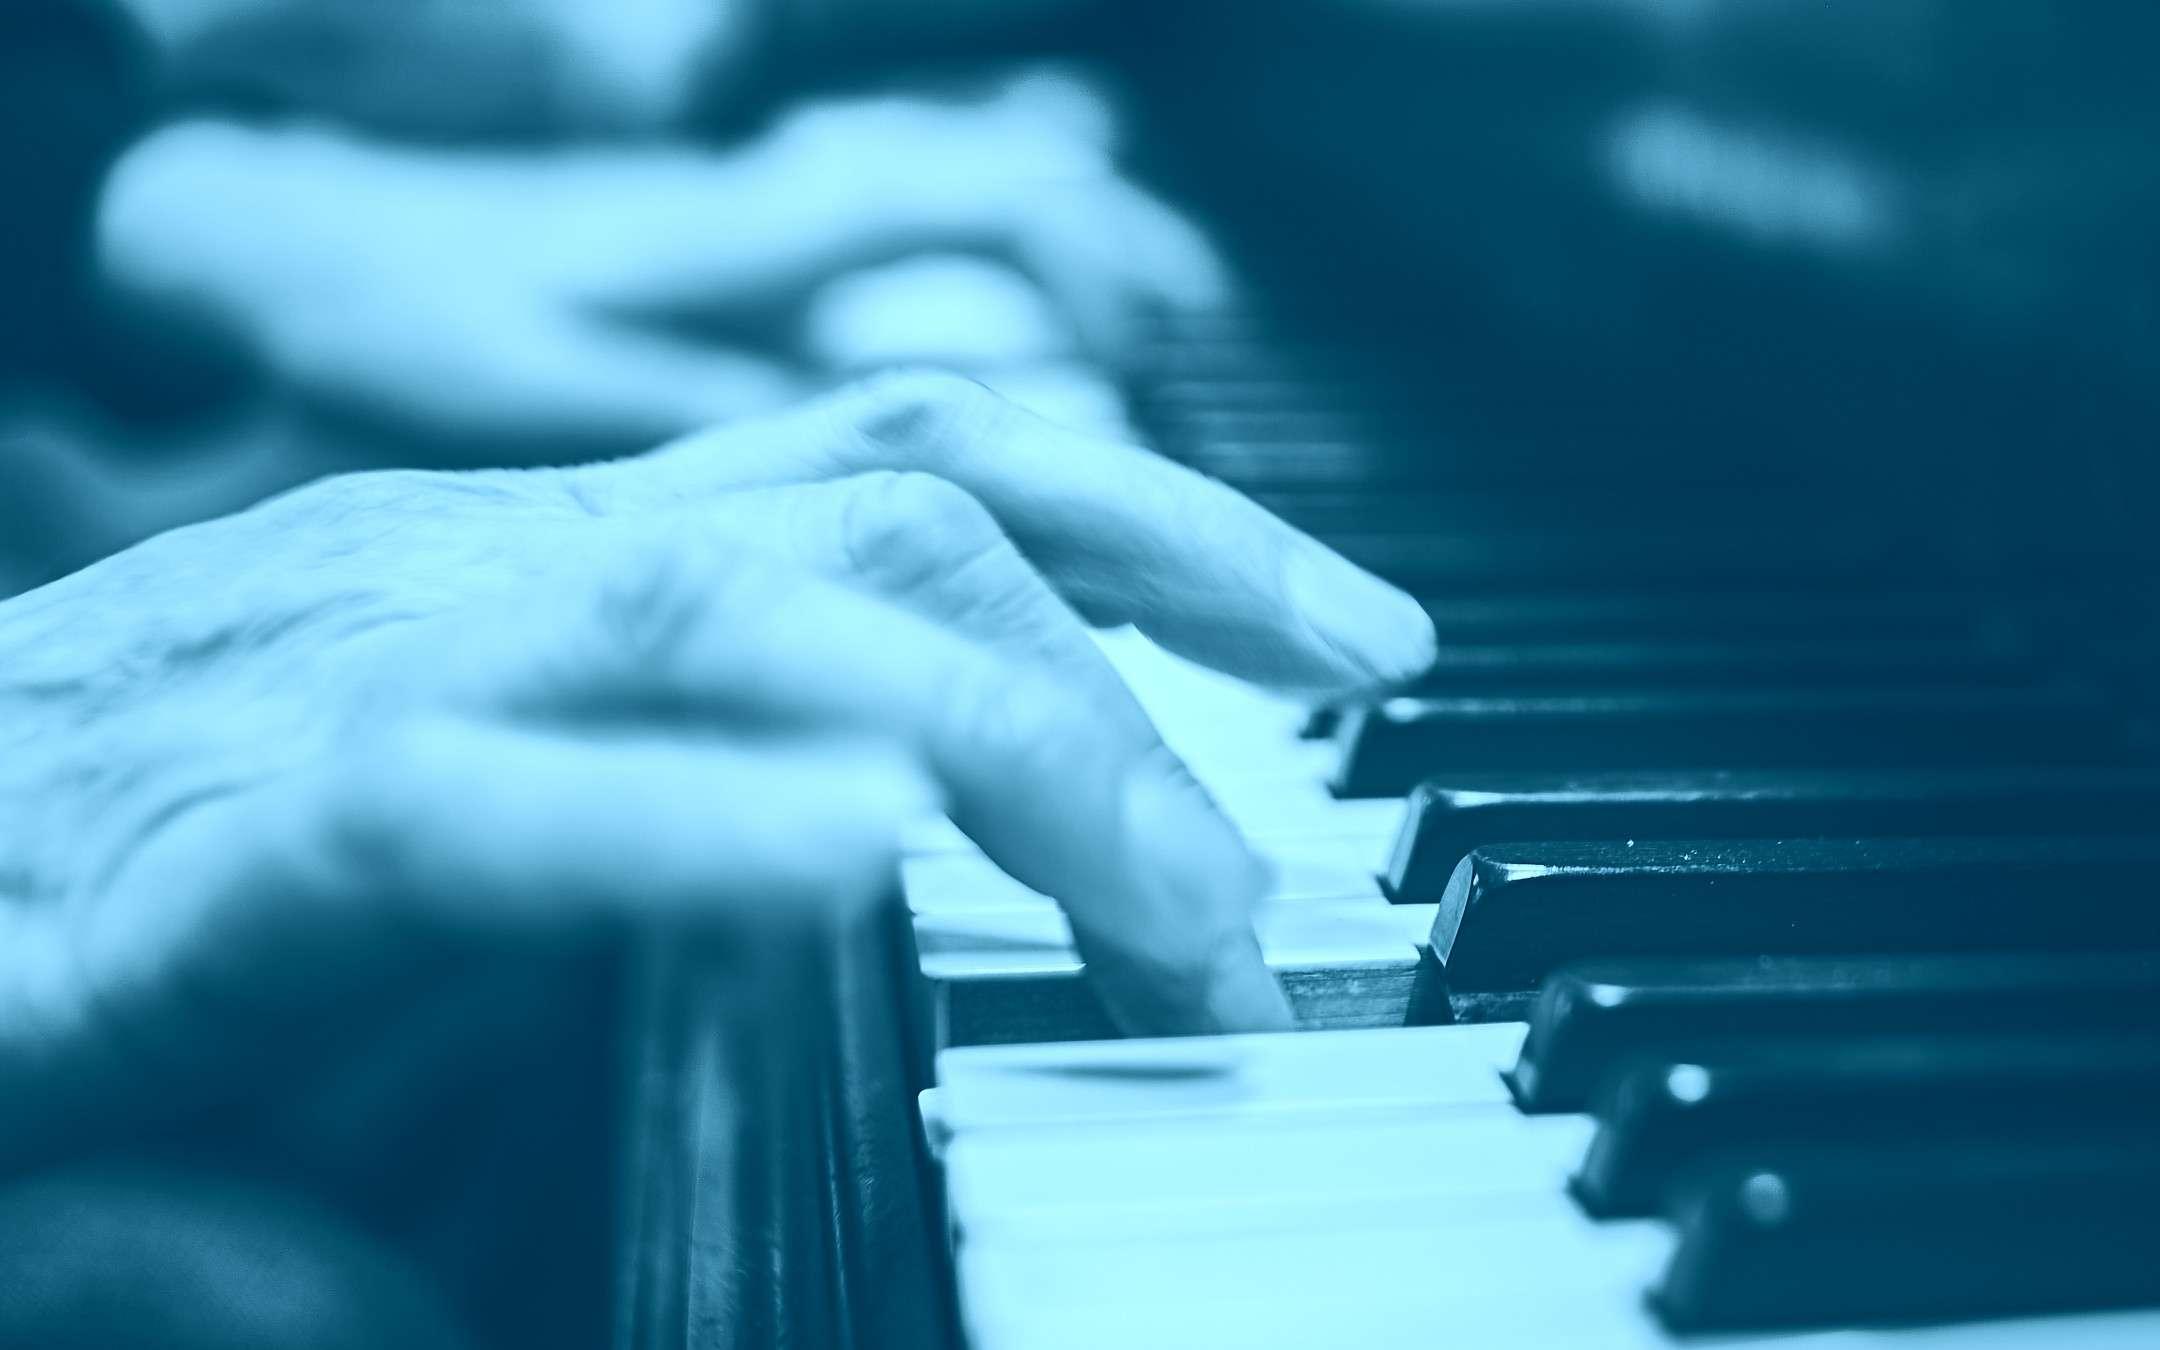 December 27, Jazz streaming with Huawei